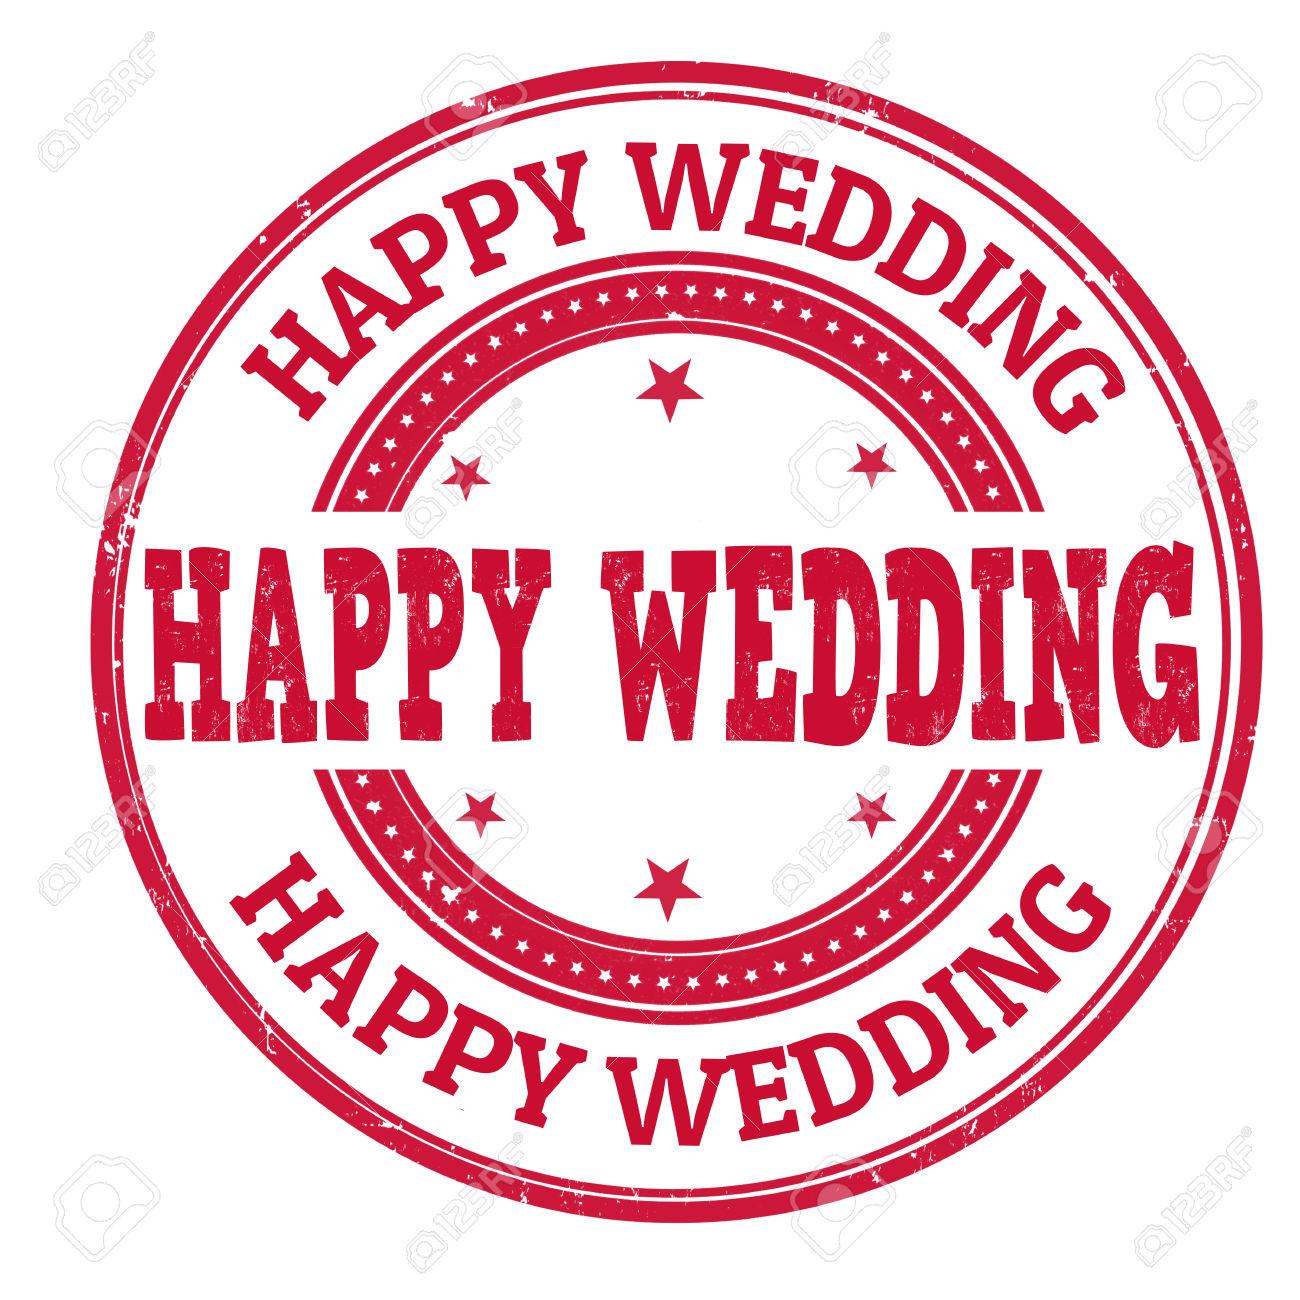 Happy Wedding Grunge Rubber Stamp On White, Vector Illustration.